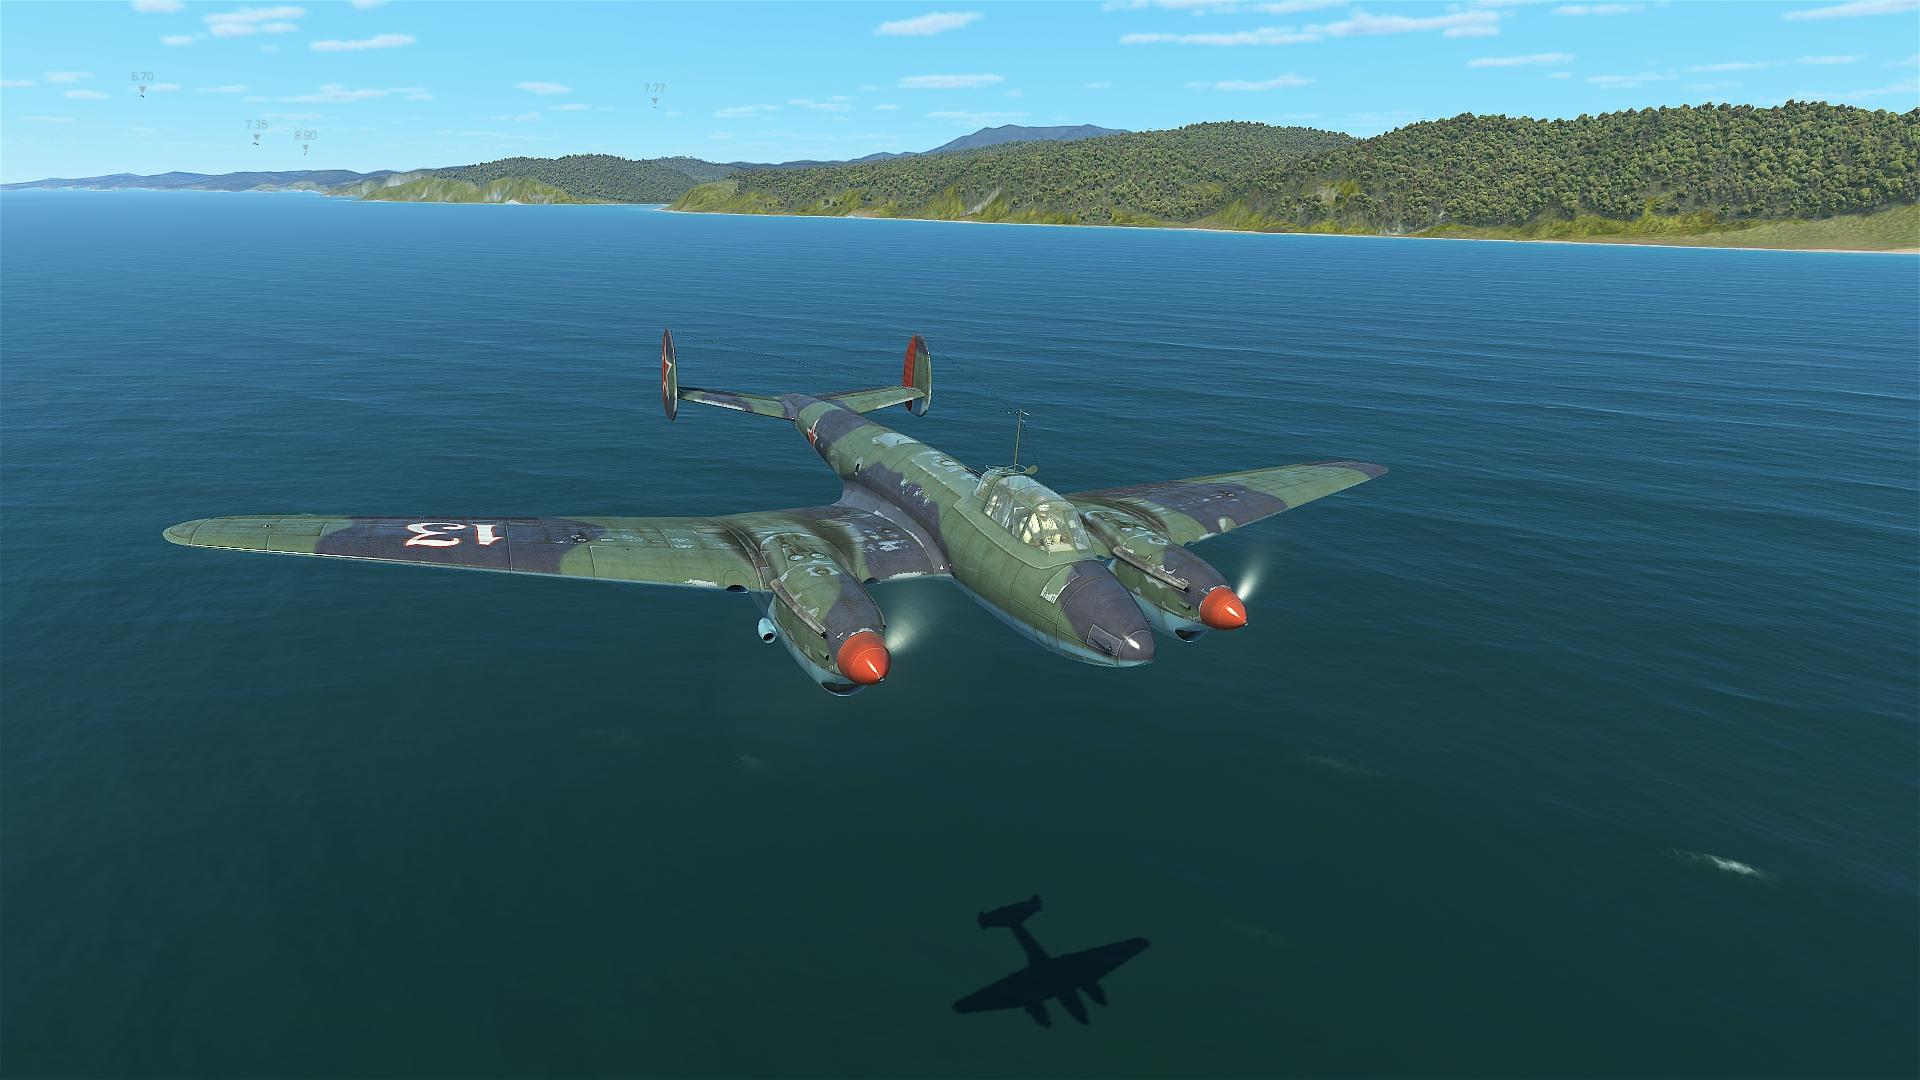 Un ptit CR en image de  la sortie de vendredi sur les Fnbf avec les NN en bomber ! 40889831014_d33a1de1f1_o